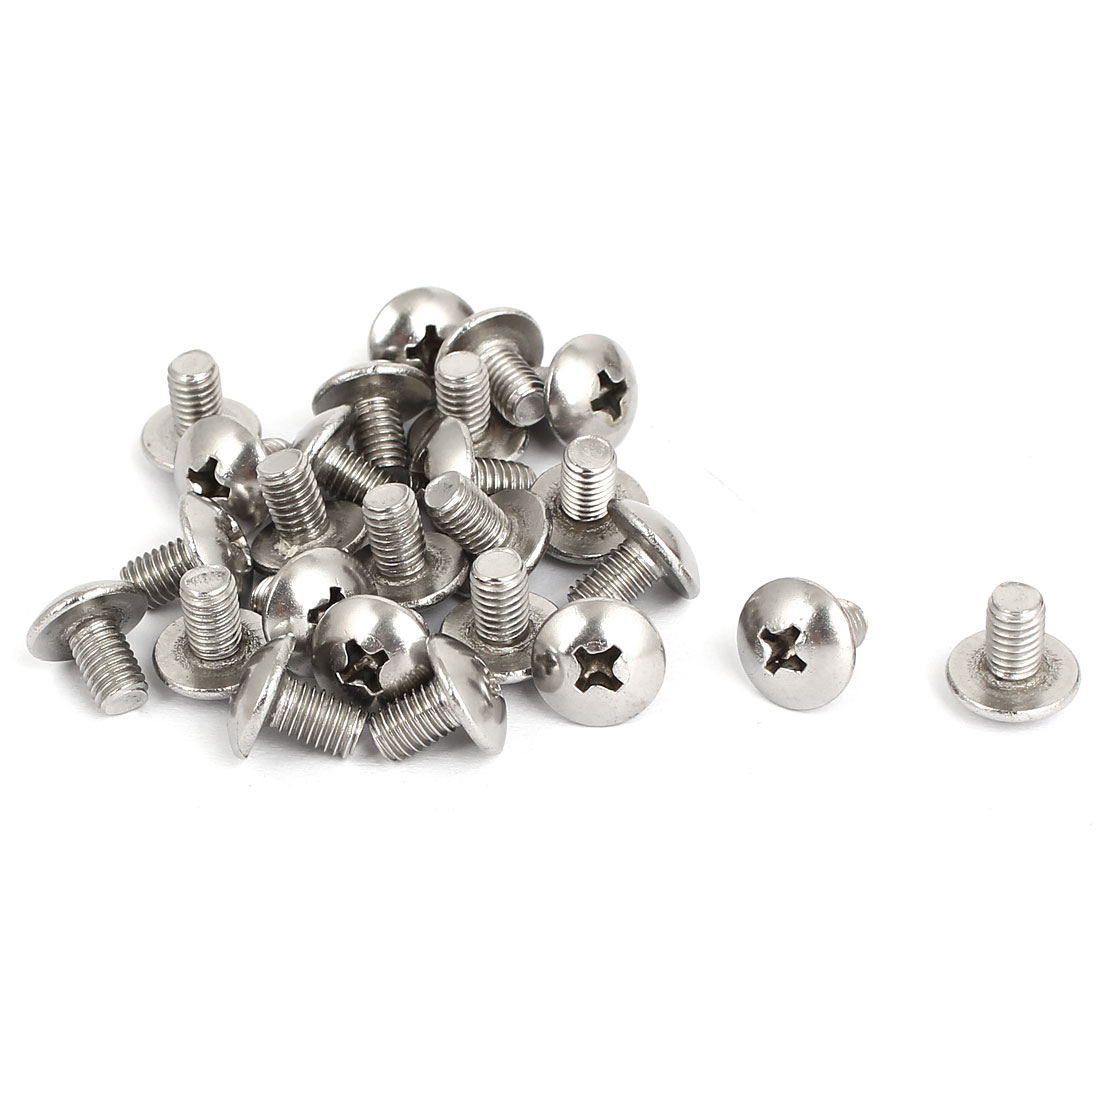 M5x8mm Stainless Steel Truss Phillips Head Machine Screws 25pcs